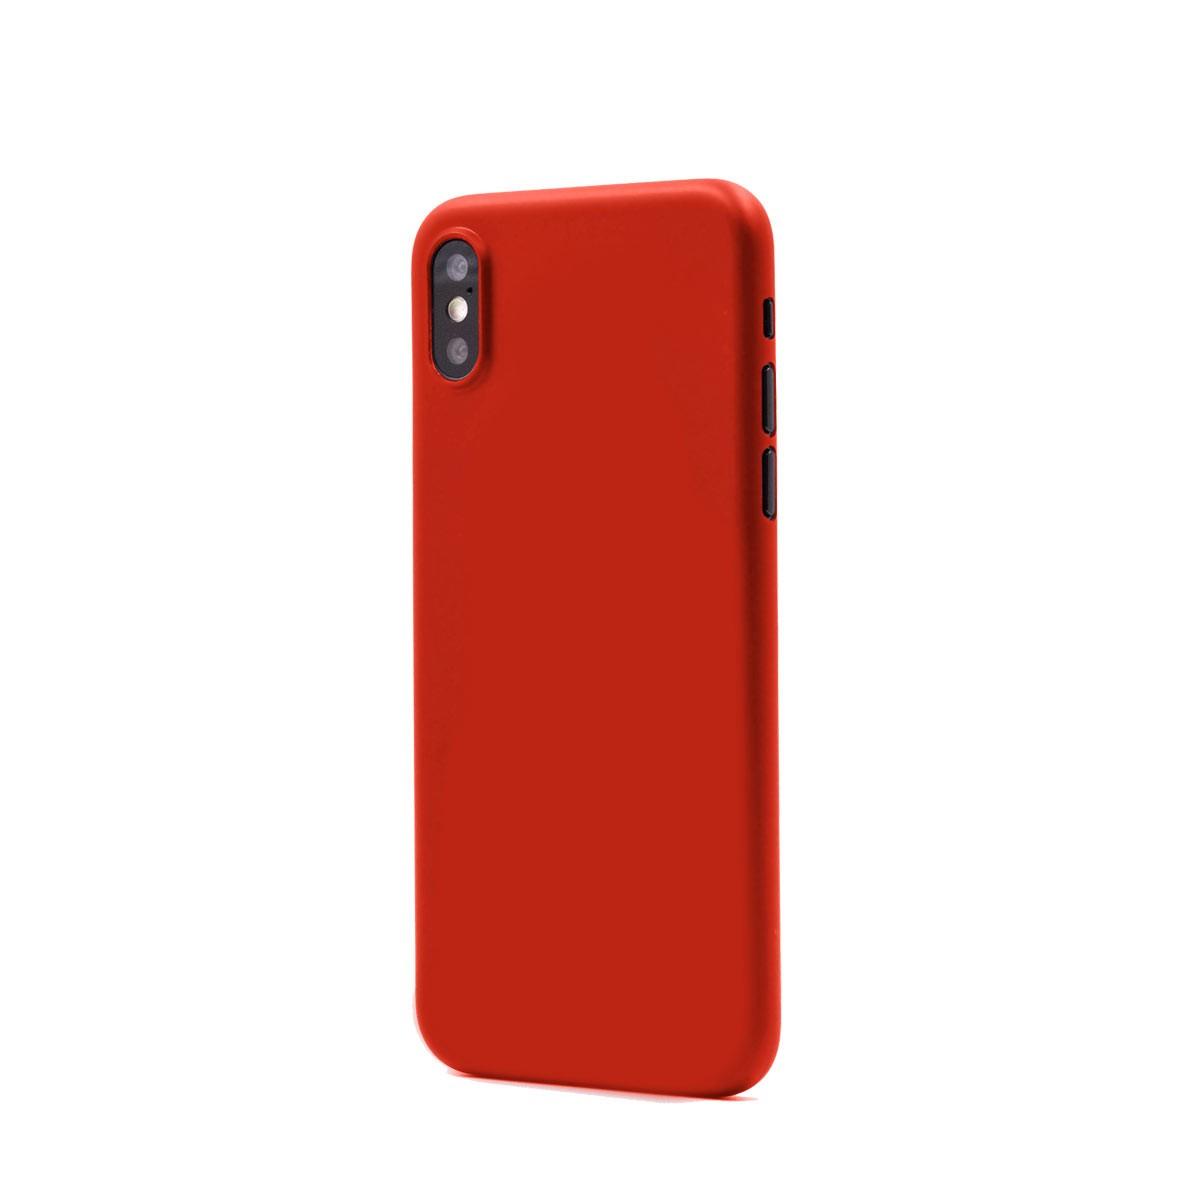 Capac protectie spate cellara colectia thin pentru iphone xs - rosu